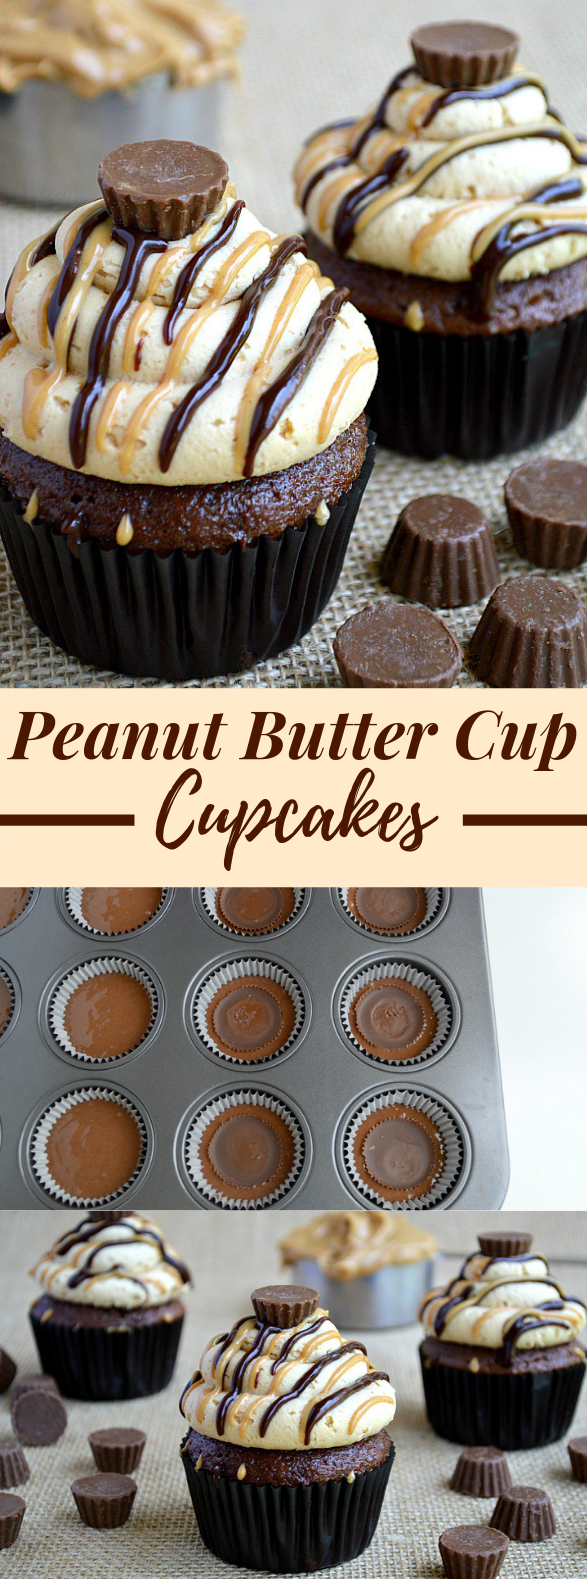 PEANUT BUTTER CUP CUPCAKES #dessert #chocolate